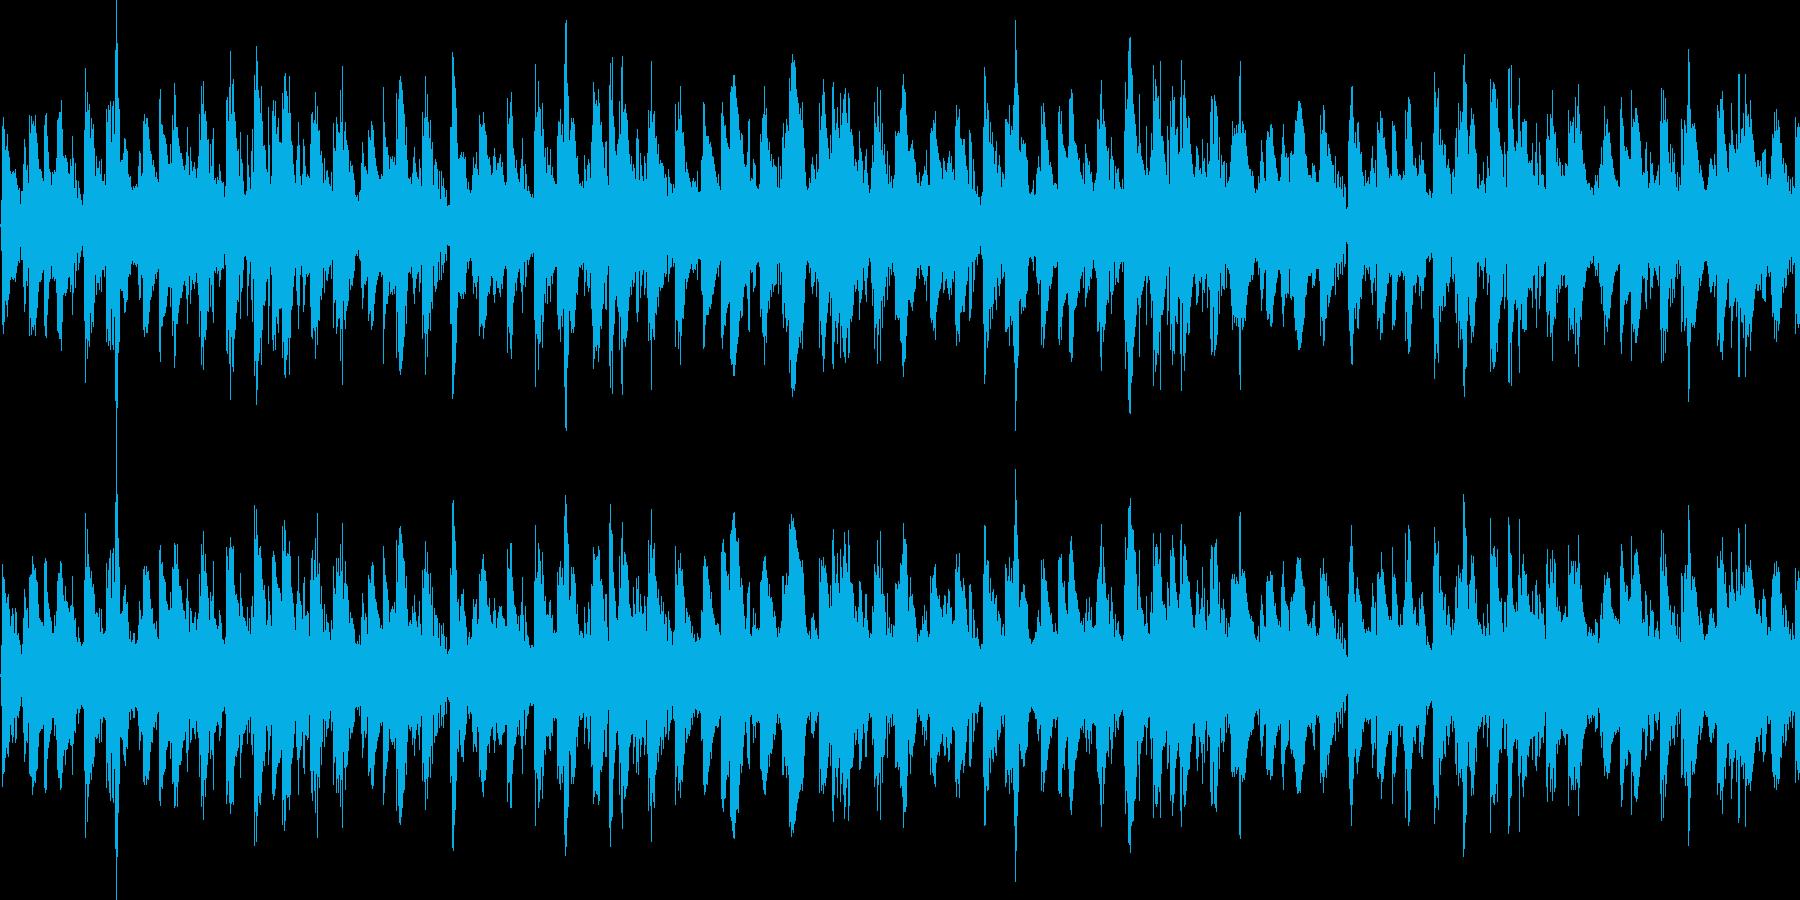 BGMに最適 おしゃれなループ音源の再生済みの波形